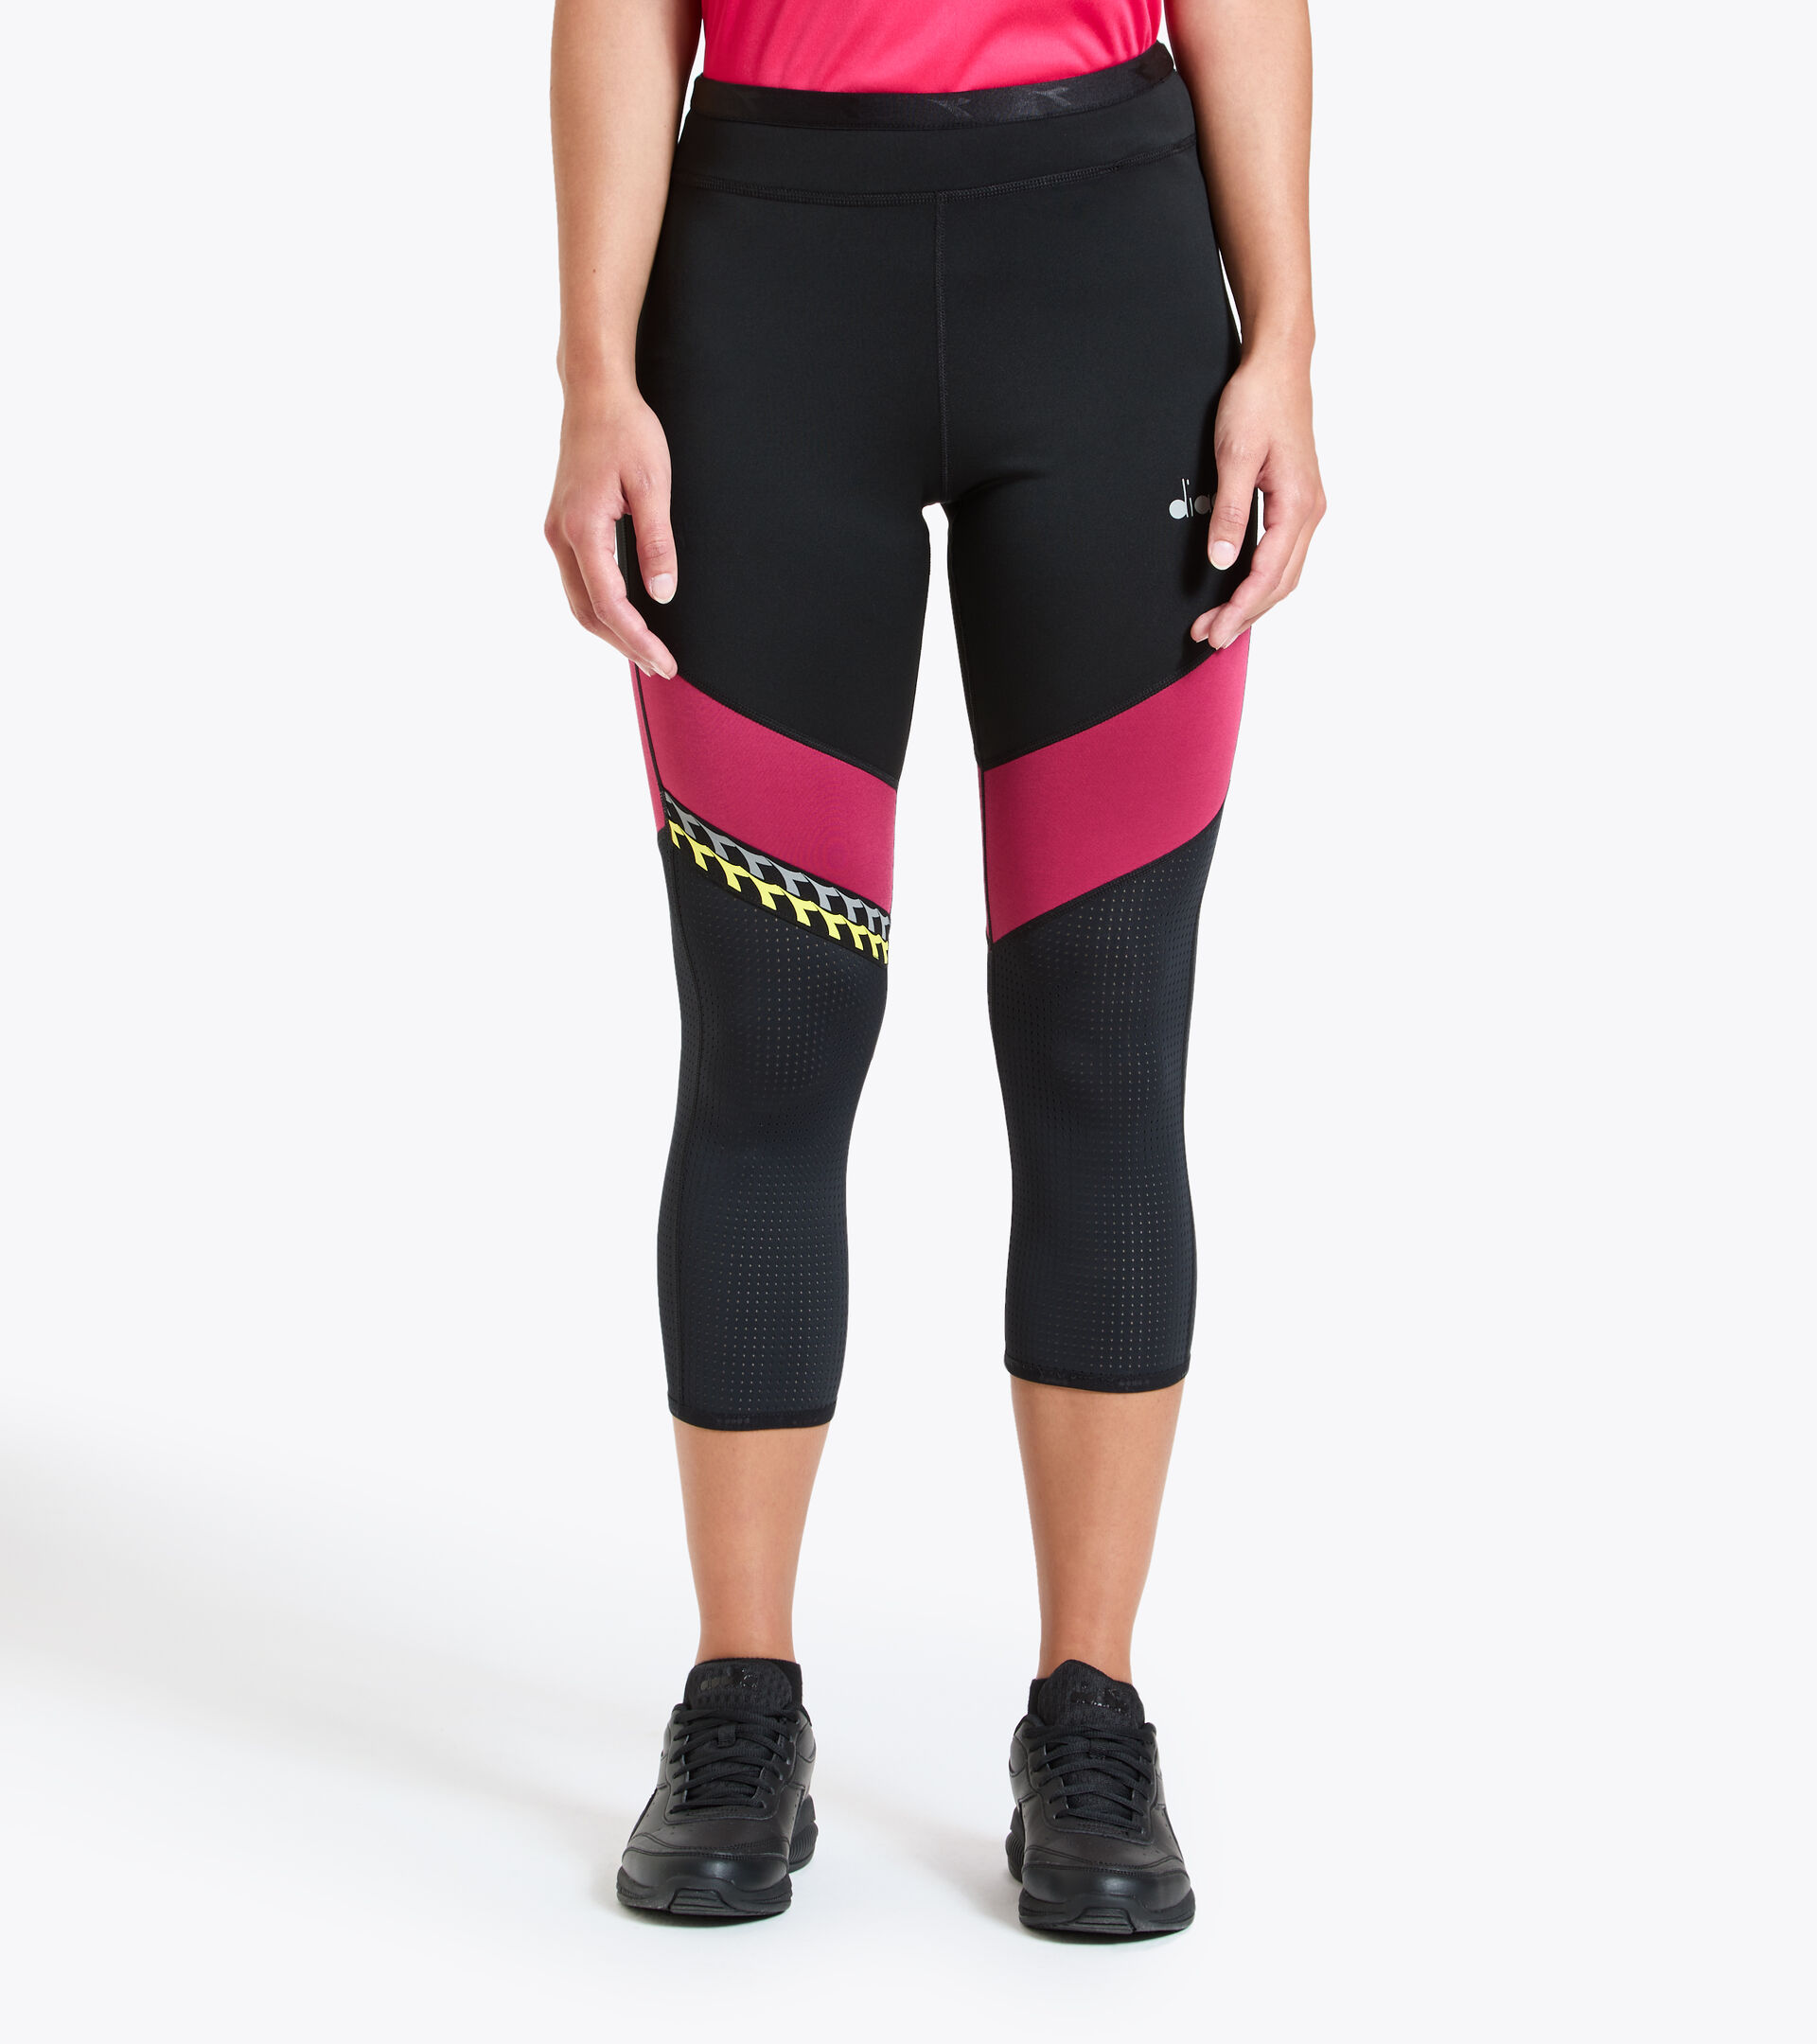 Leggings para correr - Mujer L. 6/8 REVERSIBLE TIGHTS BE ONE NEGRO - Diadora